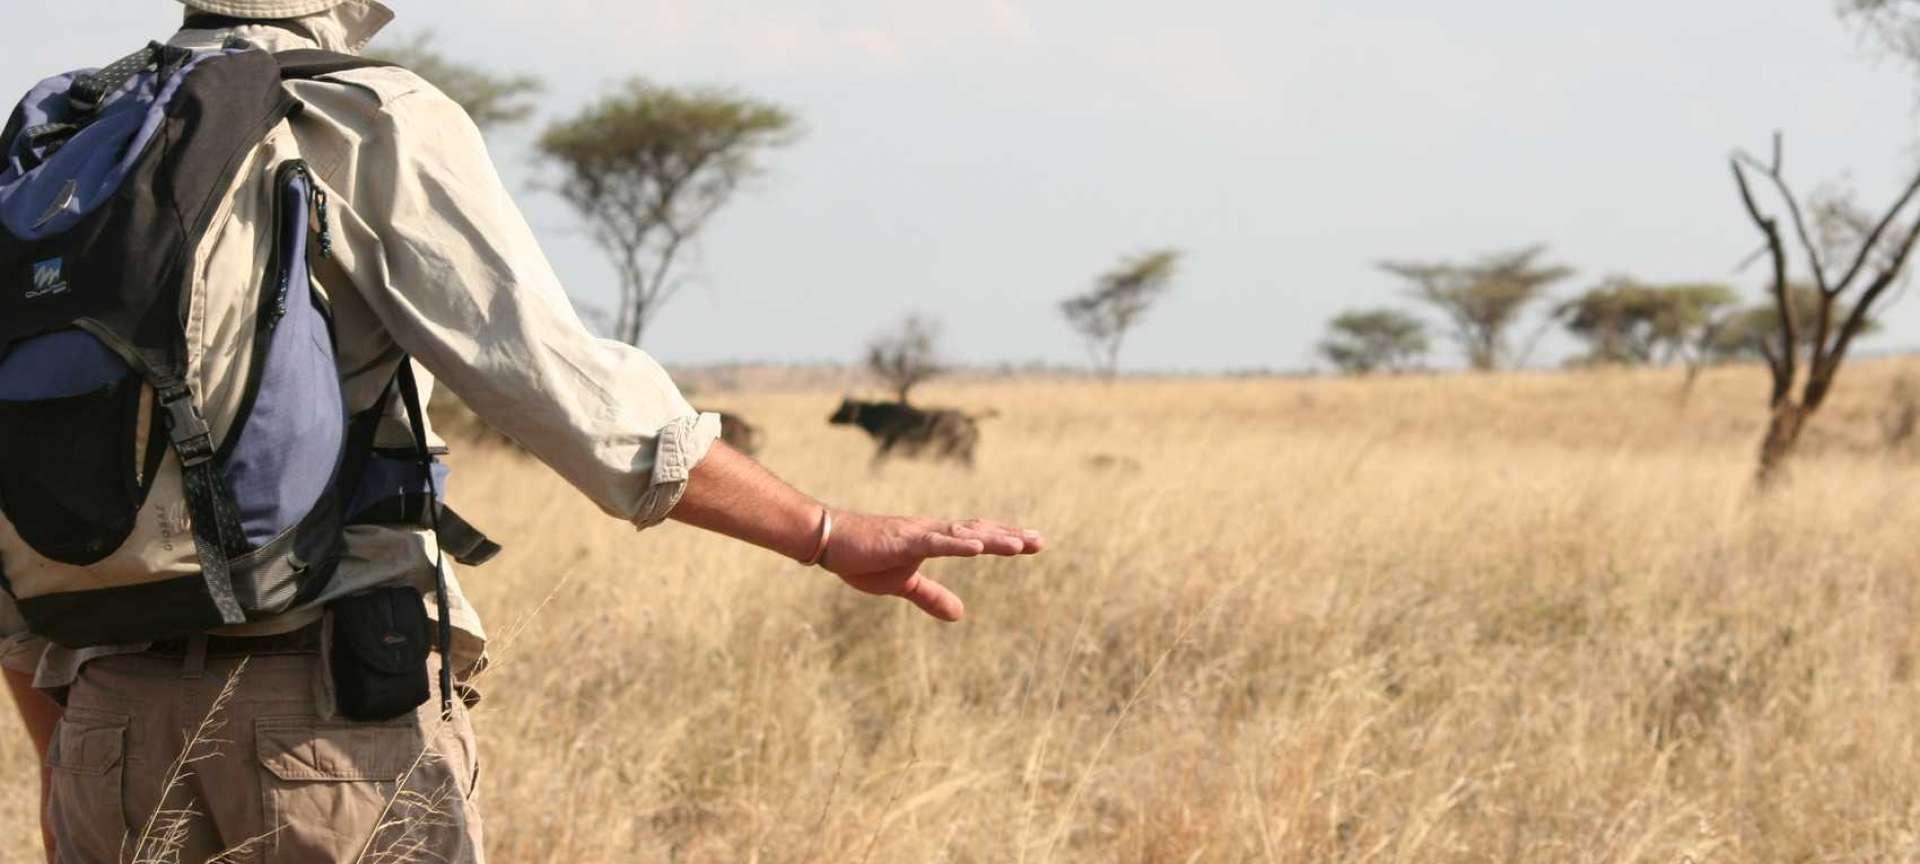 Walking safaris in Tanzania - Africa Wildlife Safaris